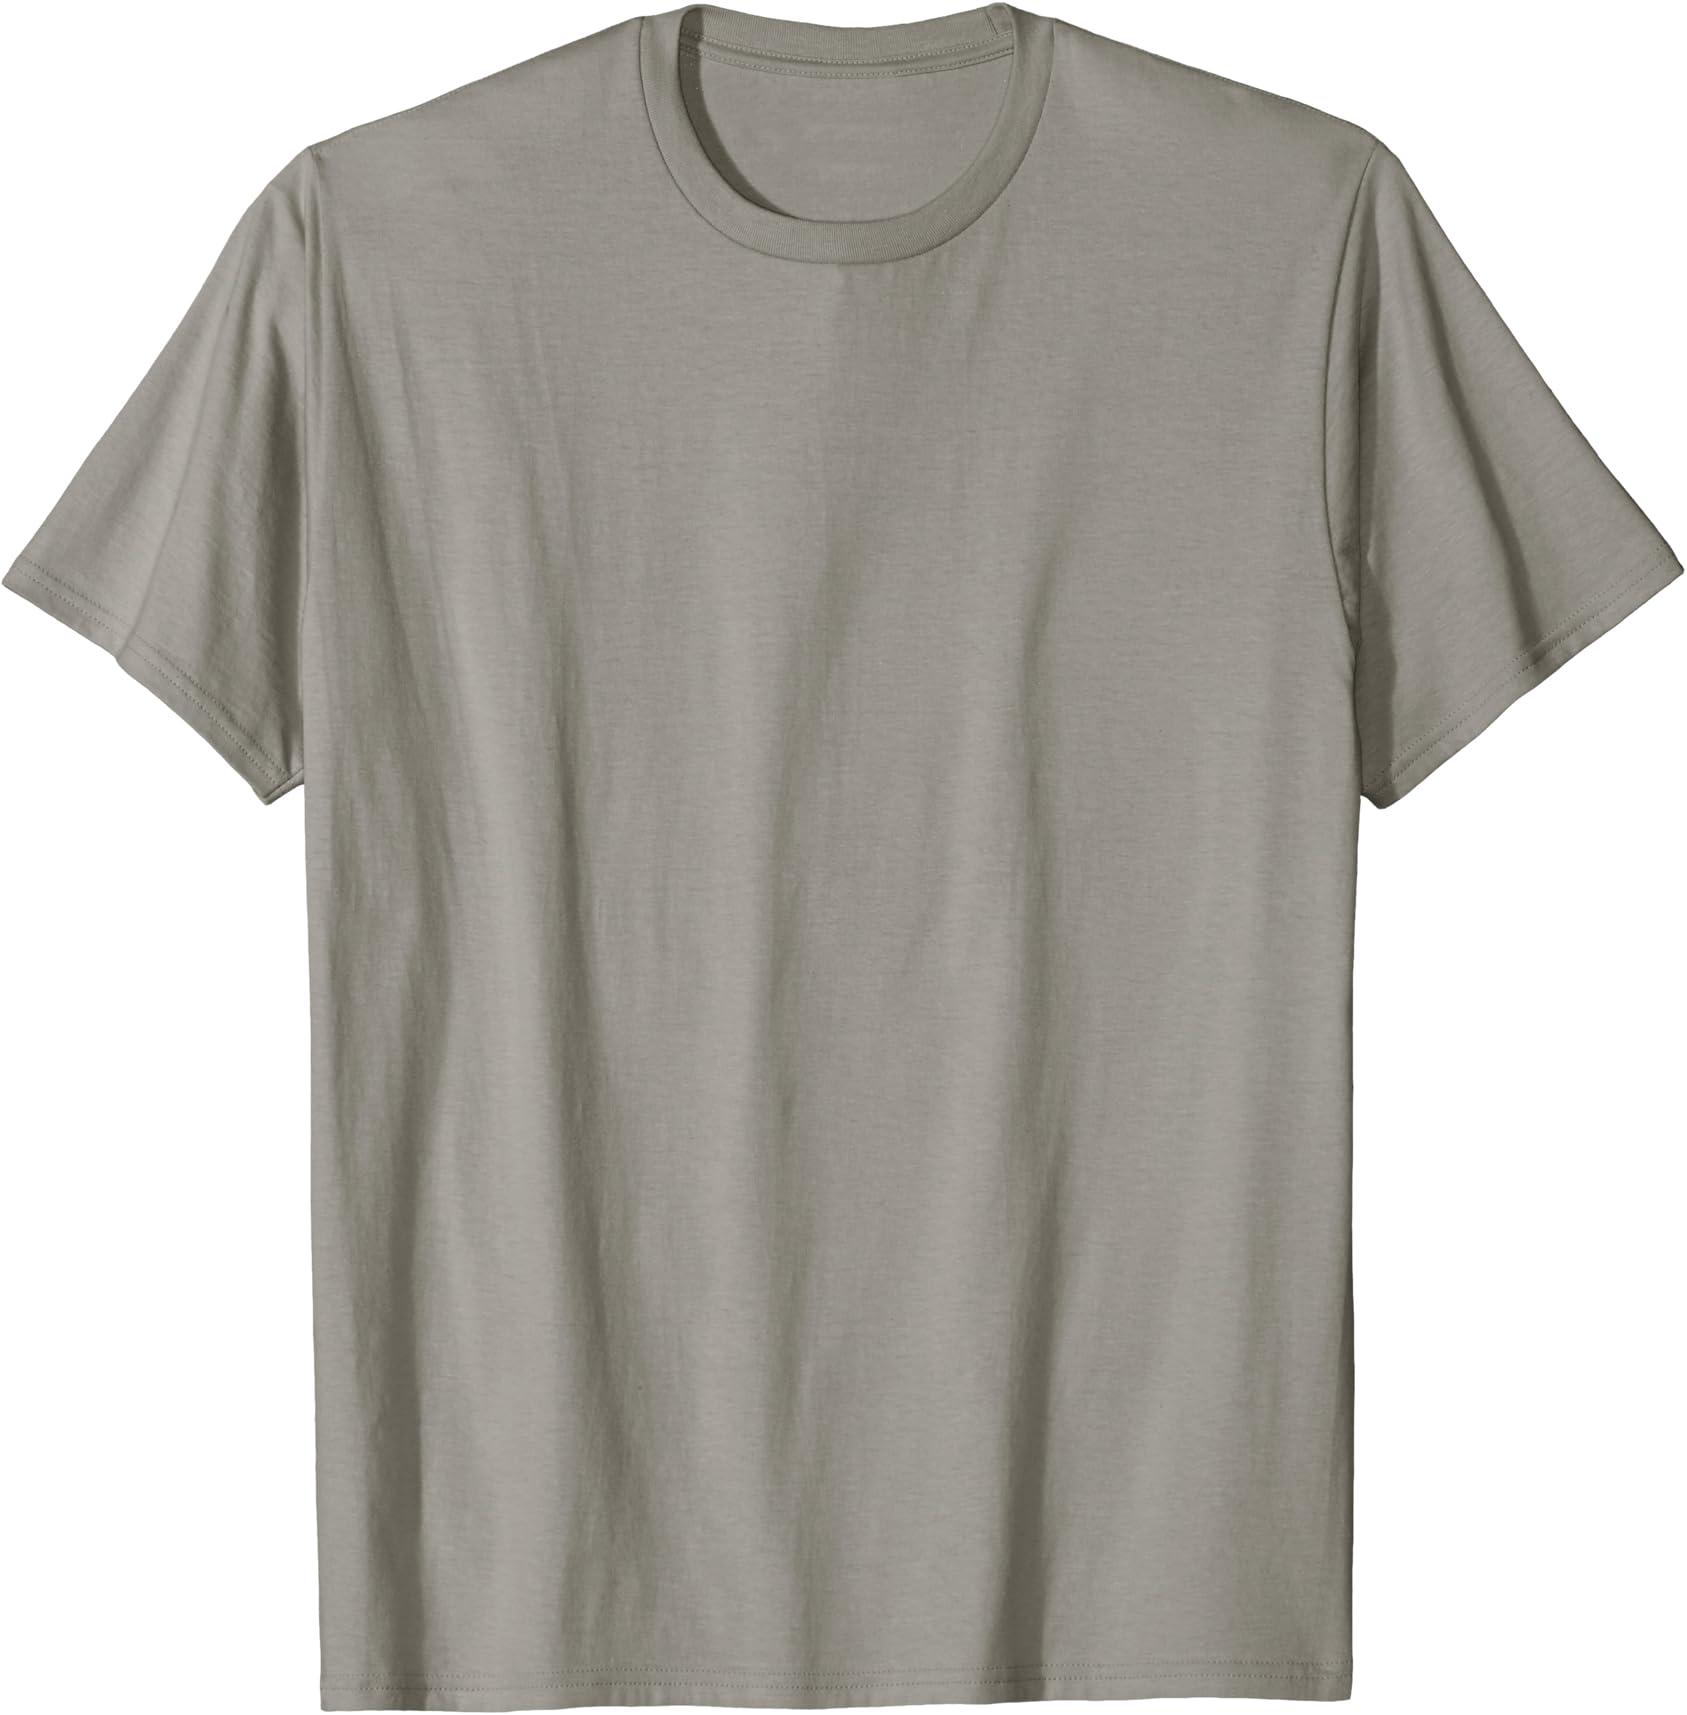 Printed T shirt tee Made in 1952 happy birthday present gift idea original